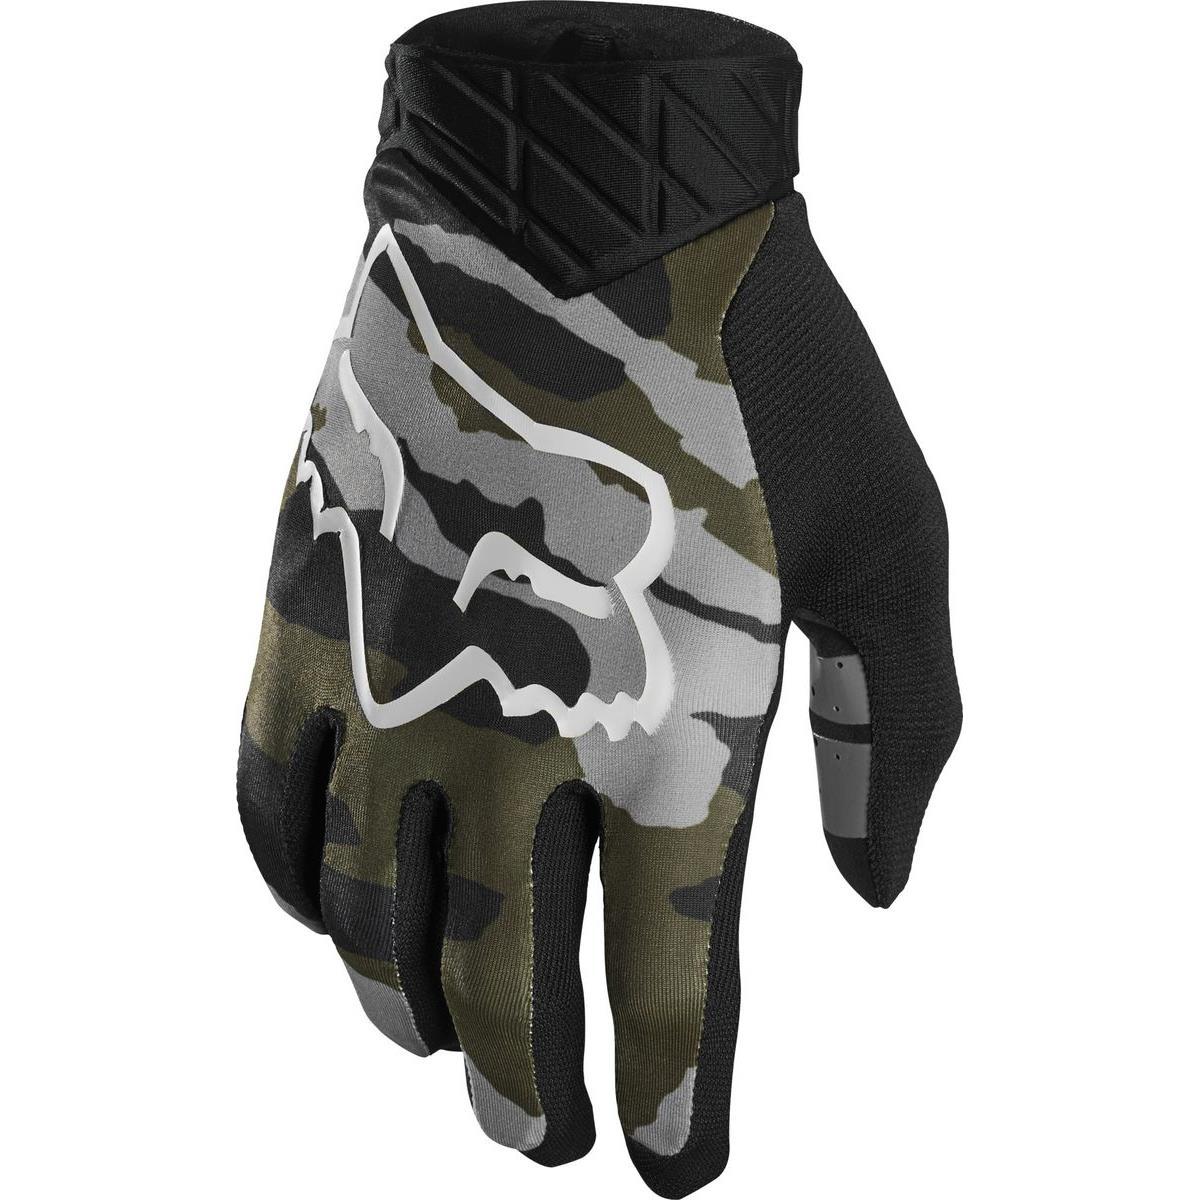 FOX MTB-Handschuhe Flexair Camo Gr/ün Camo